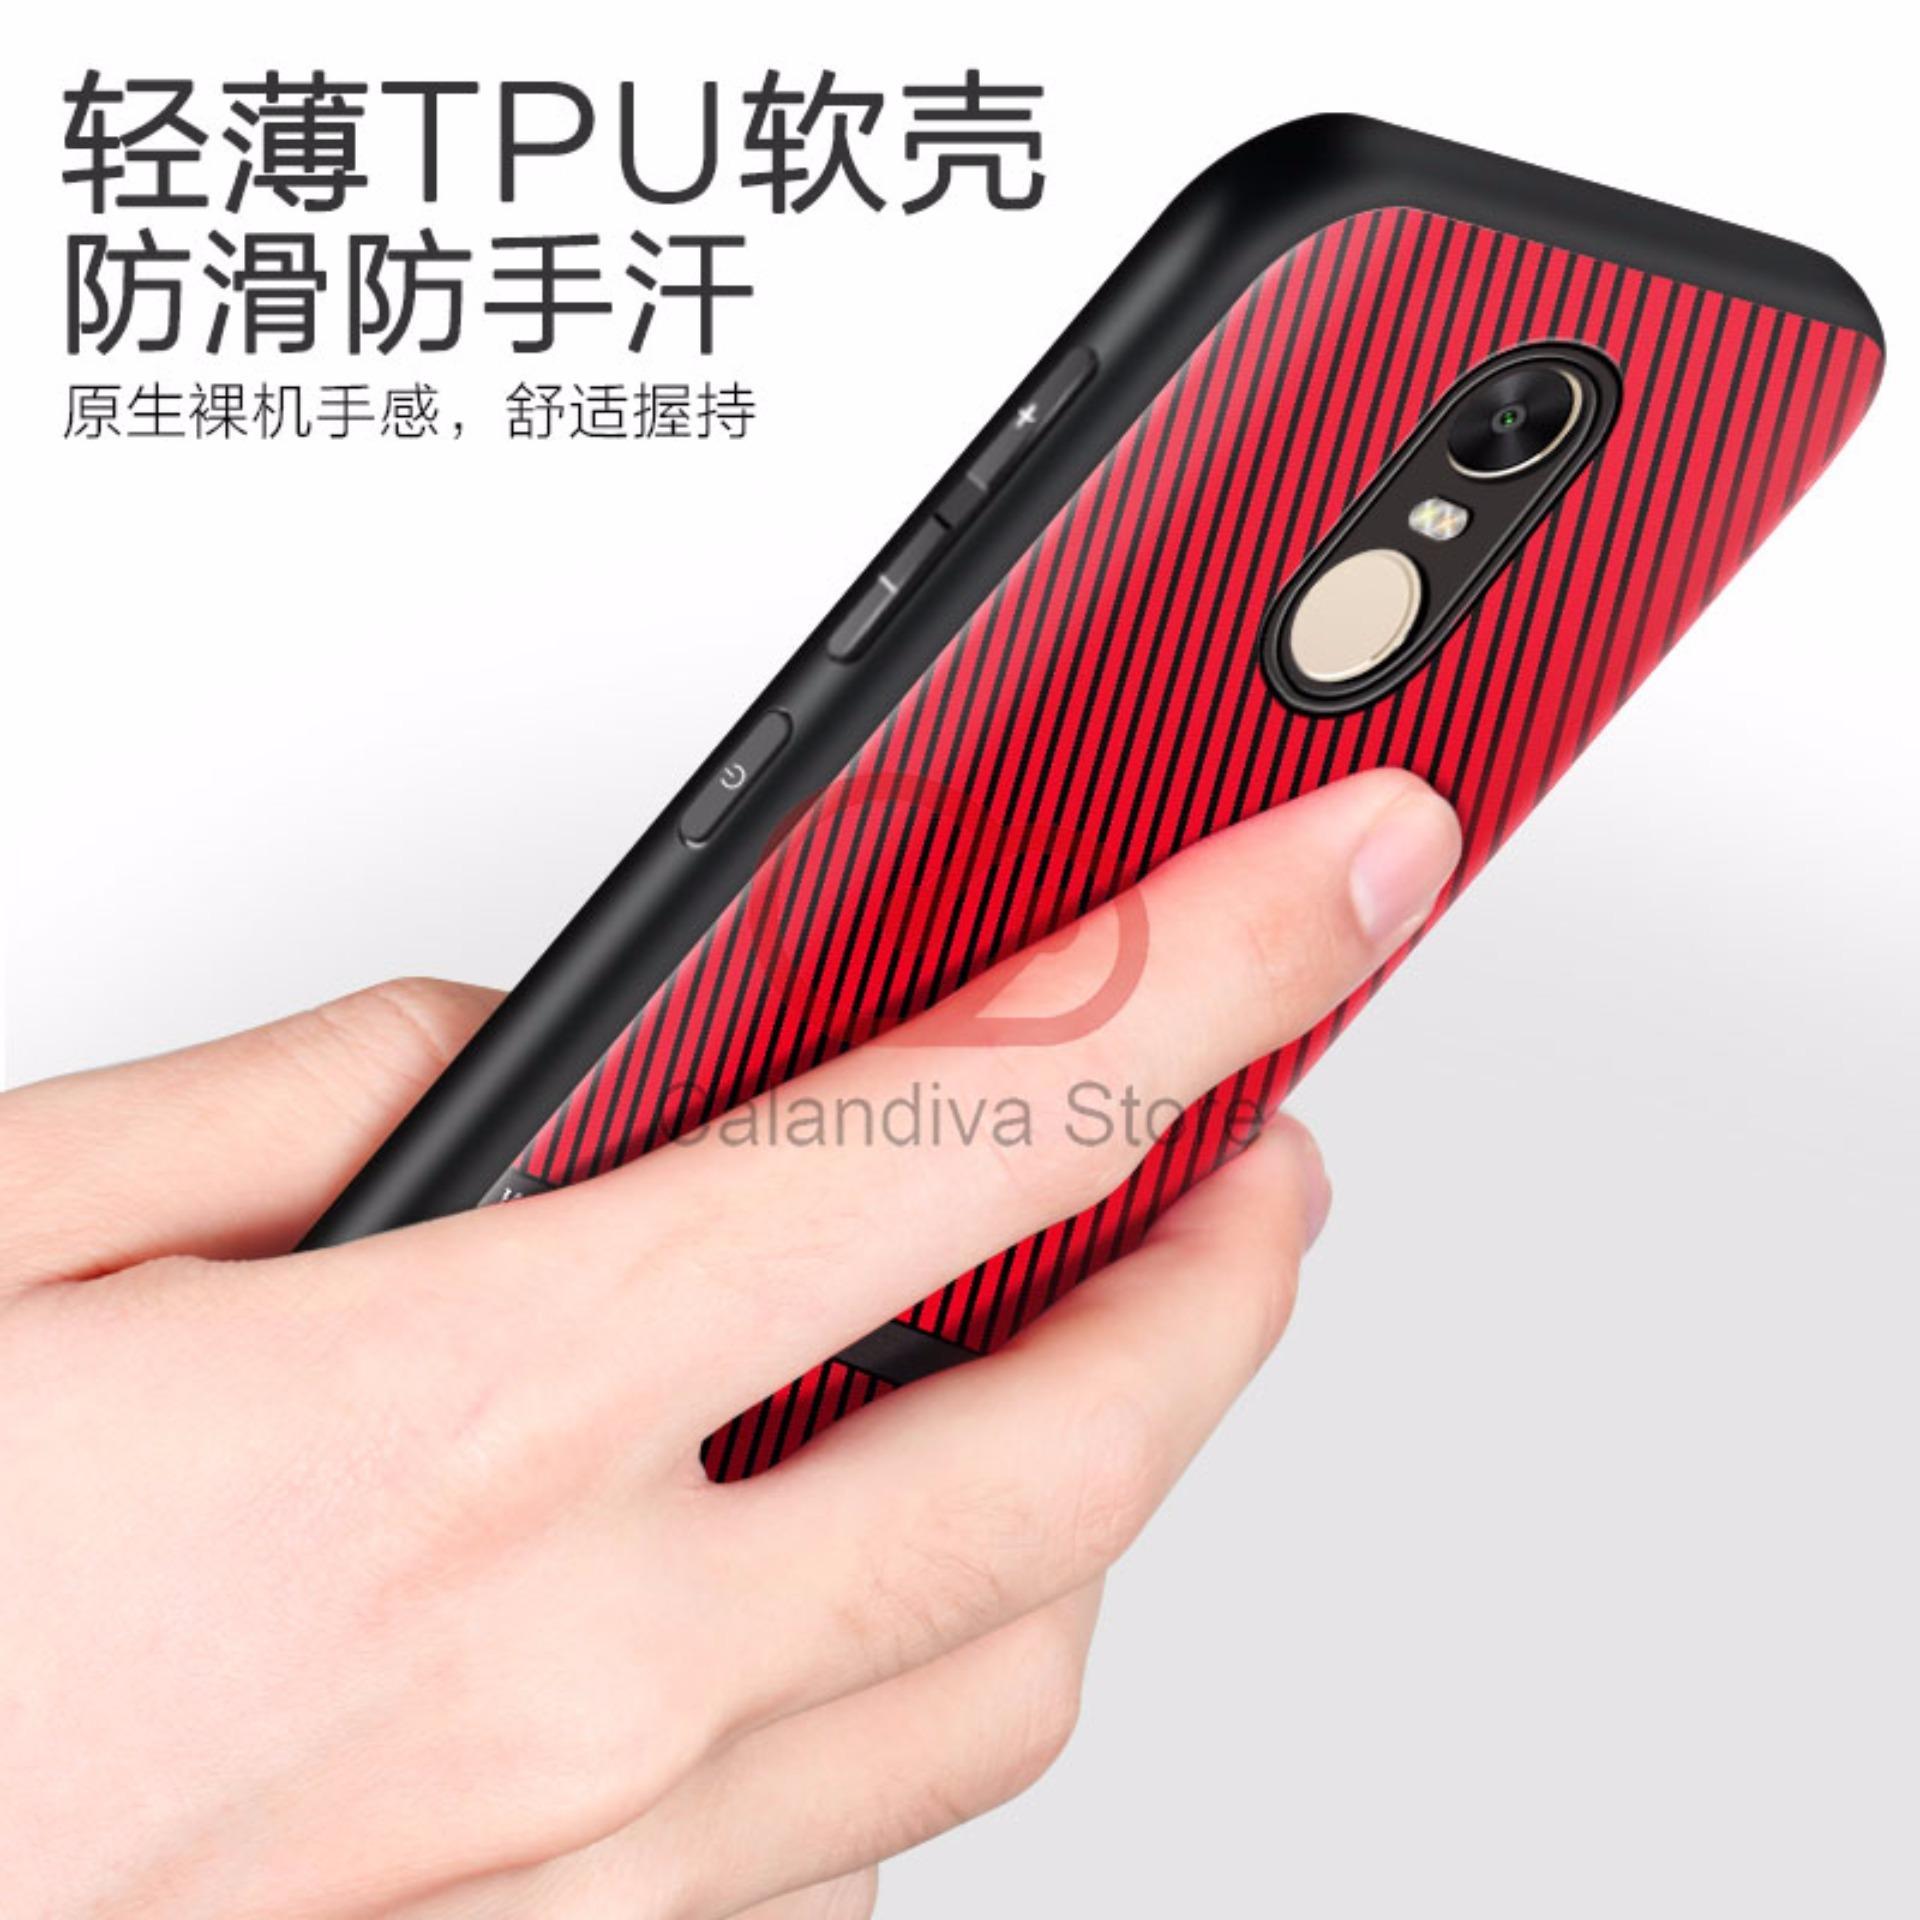 Calandiva Gentleman Series Shockproof Hybrid Case for Xiaomi Redmi Note 4 Mediatek /